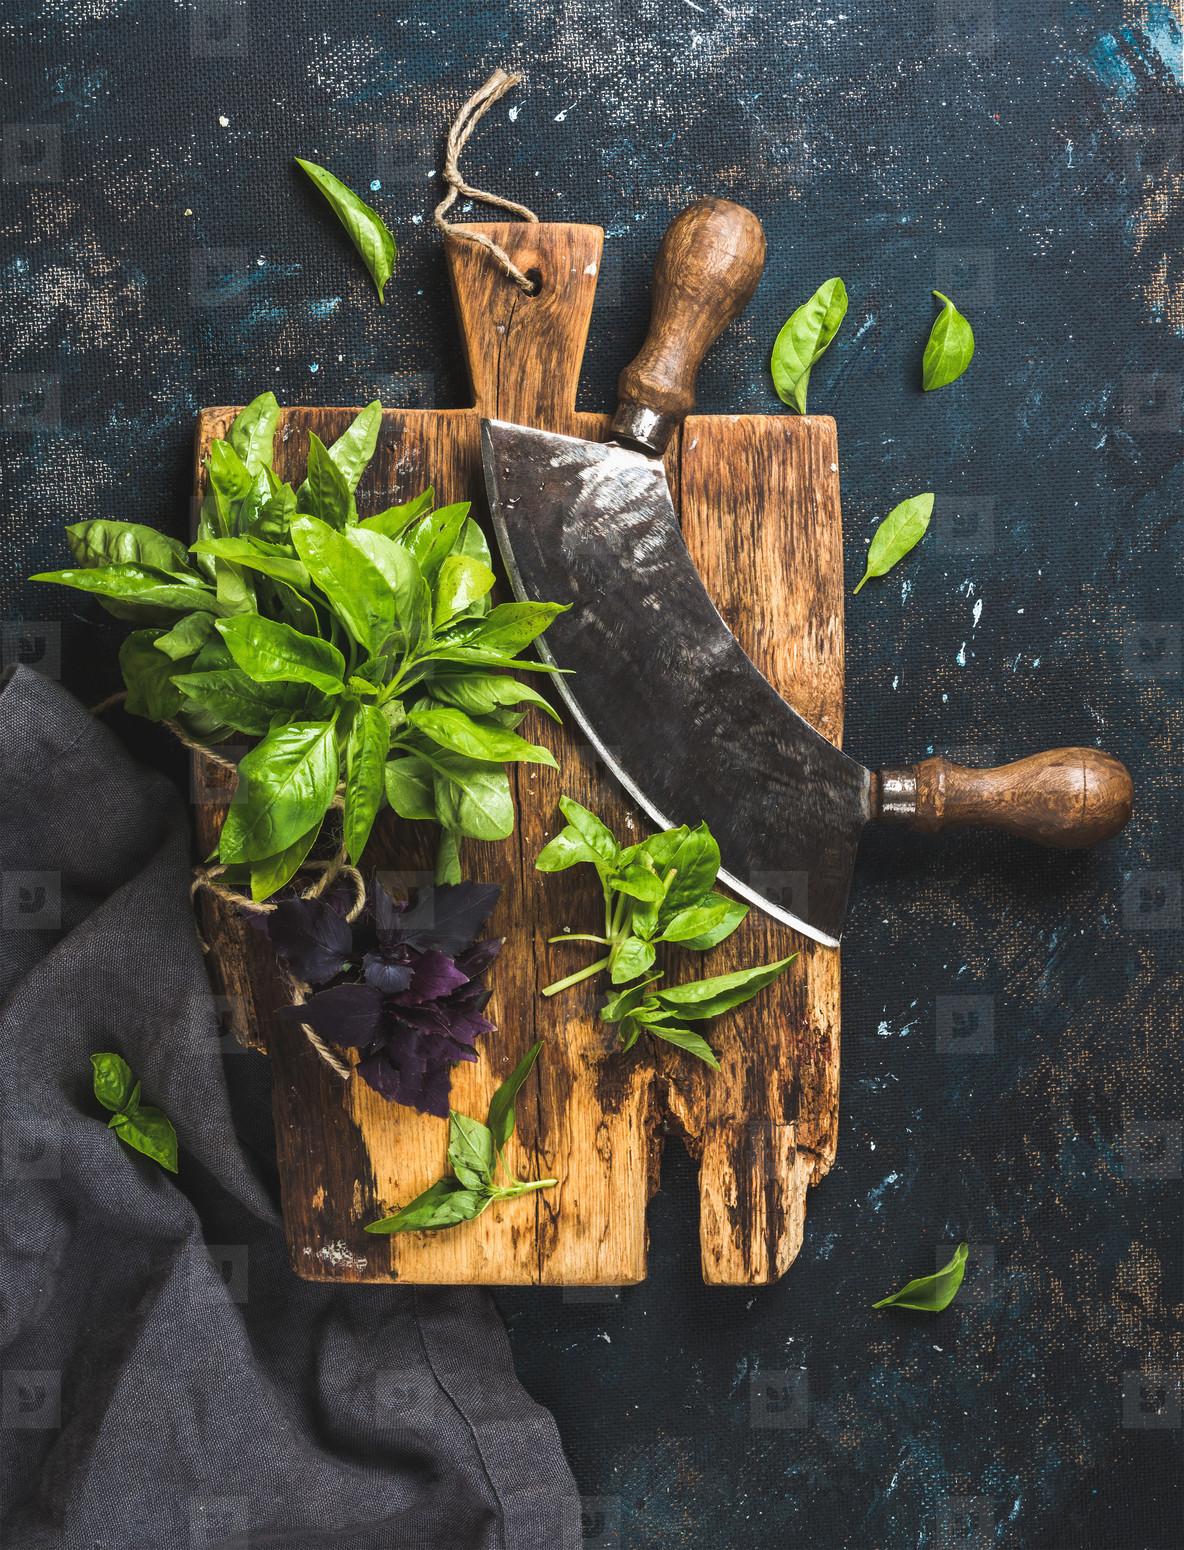 Fresh green and purple basil leaves with herb chopper knife